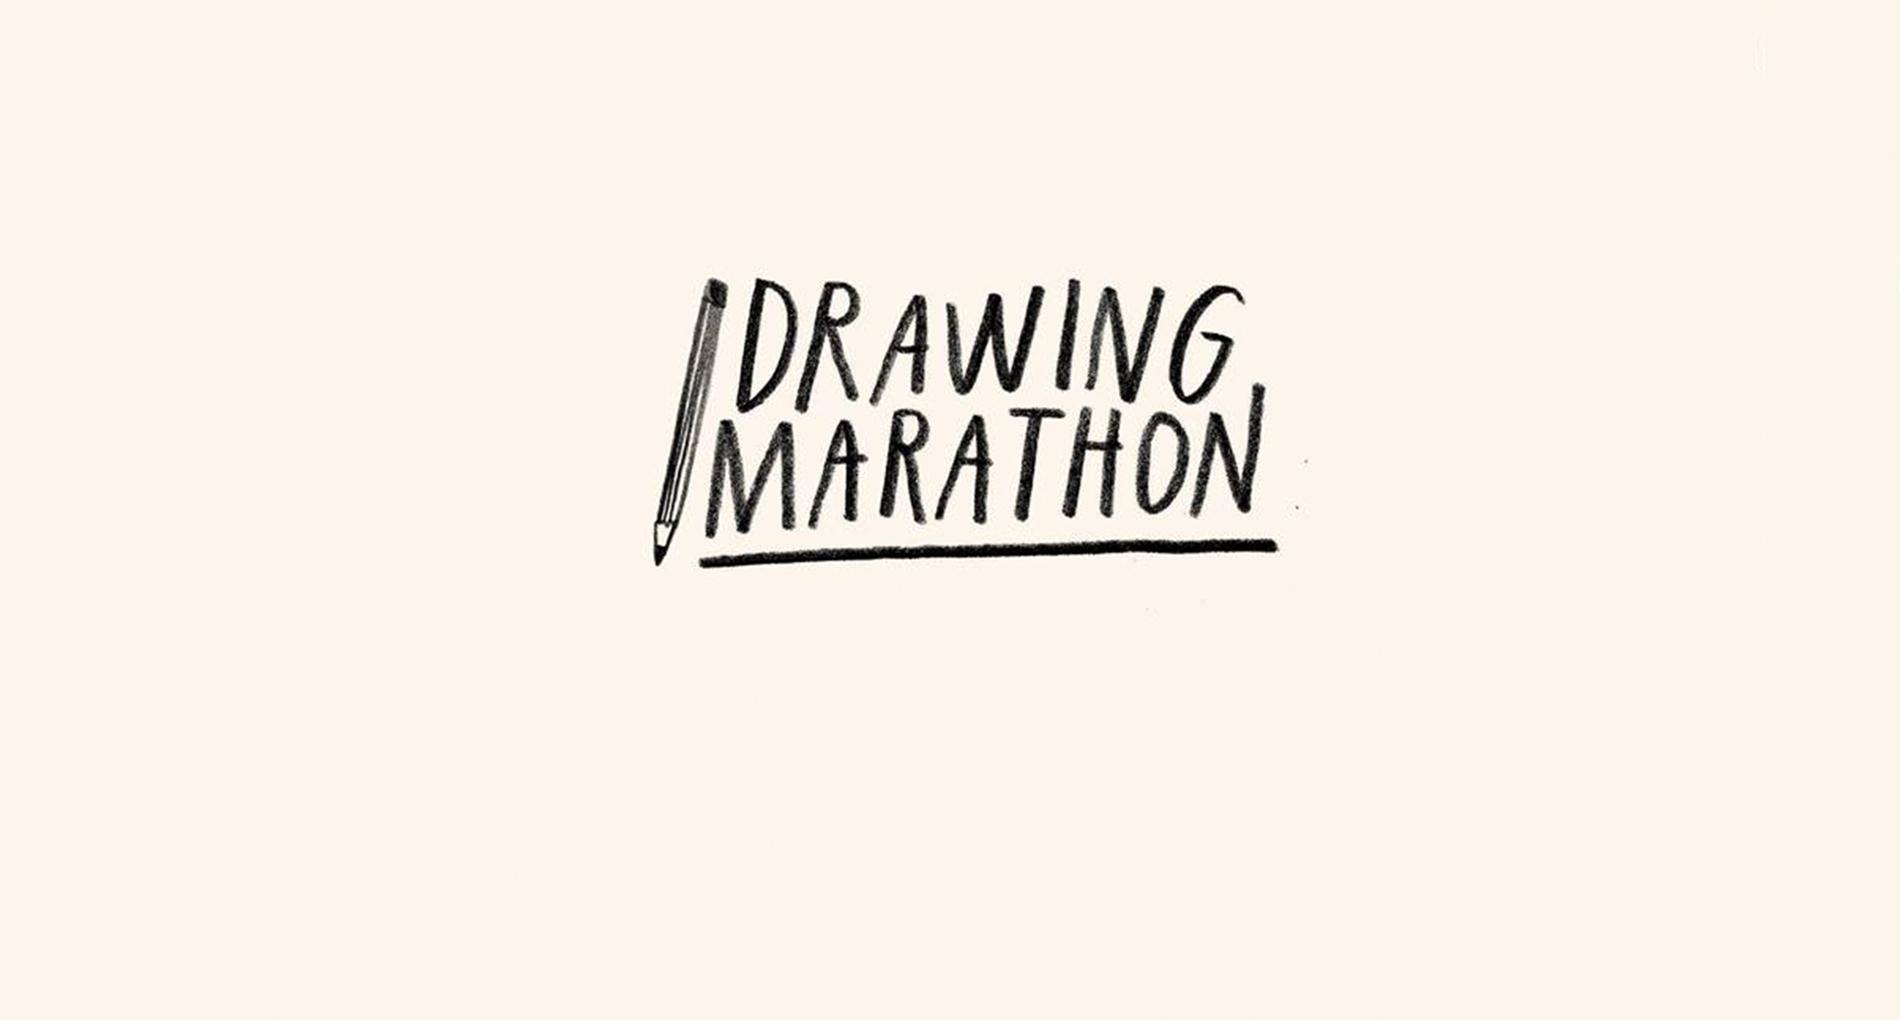 Ready, Set, Draw